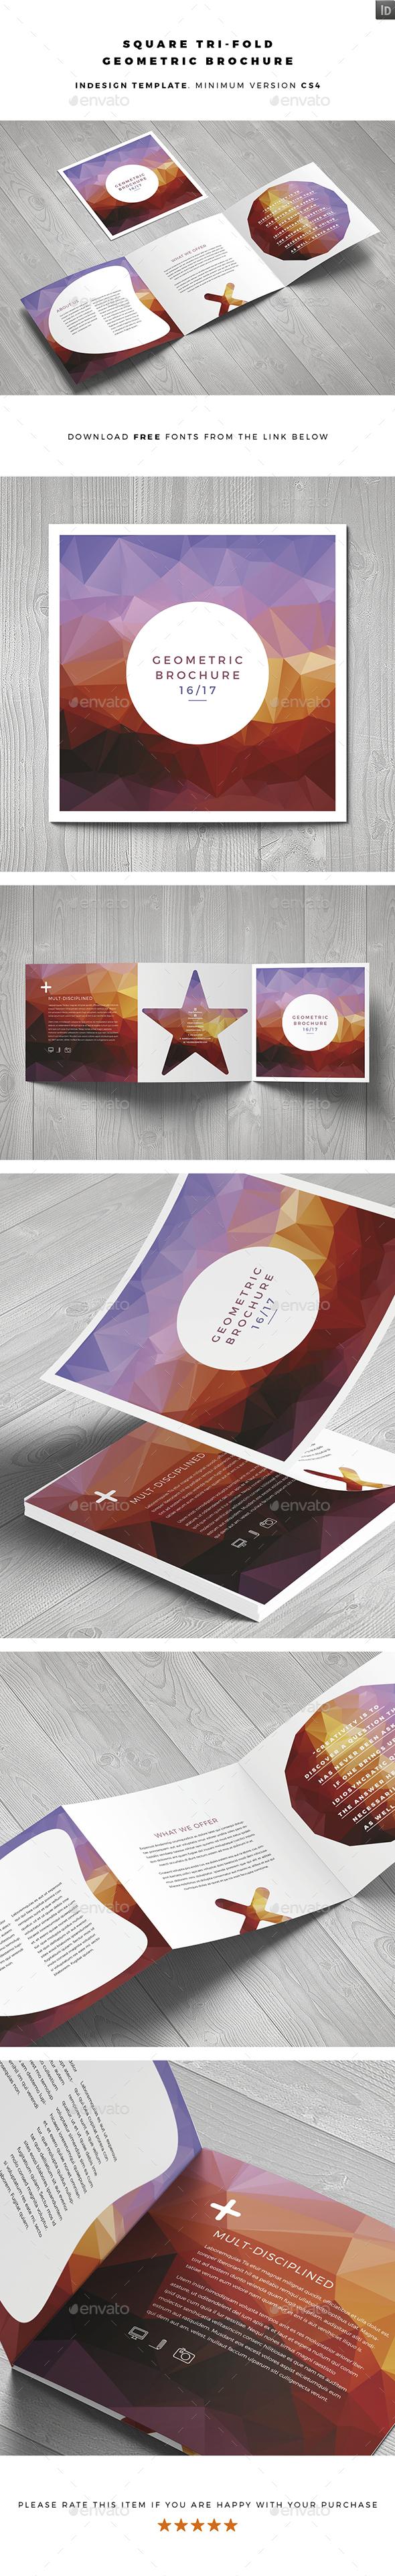 Square Geometric Brochure - Brochures Print Templates